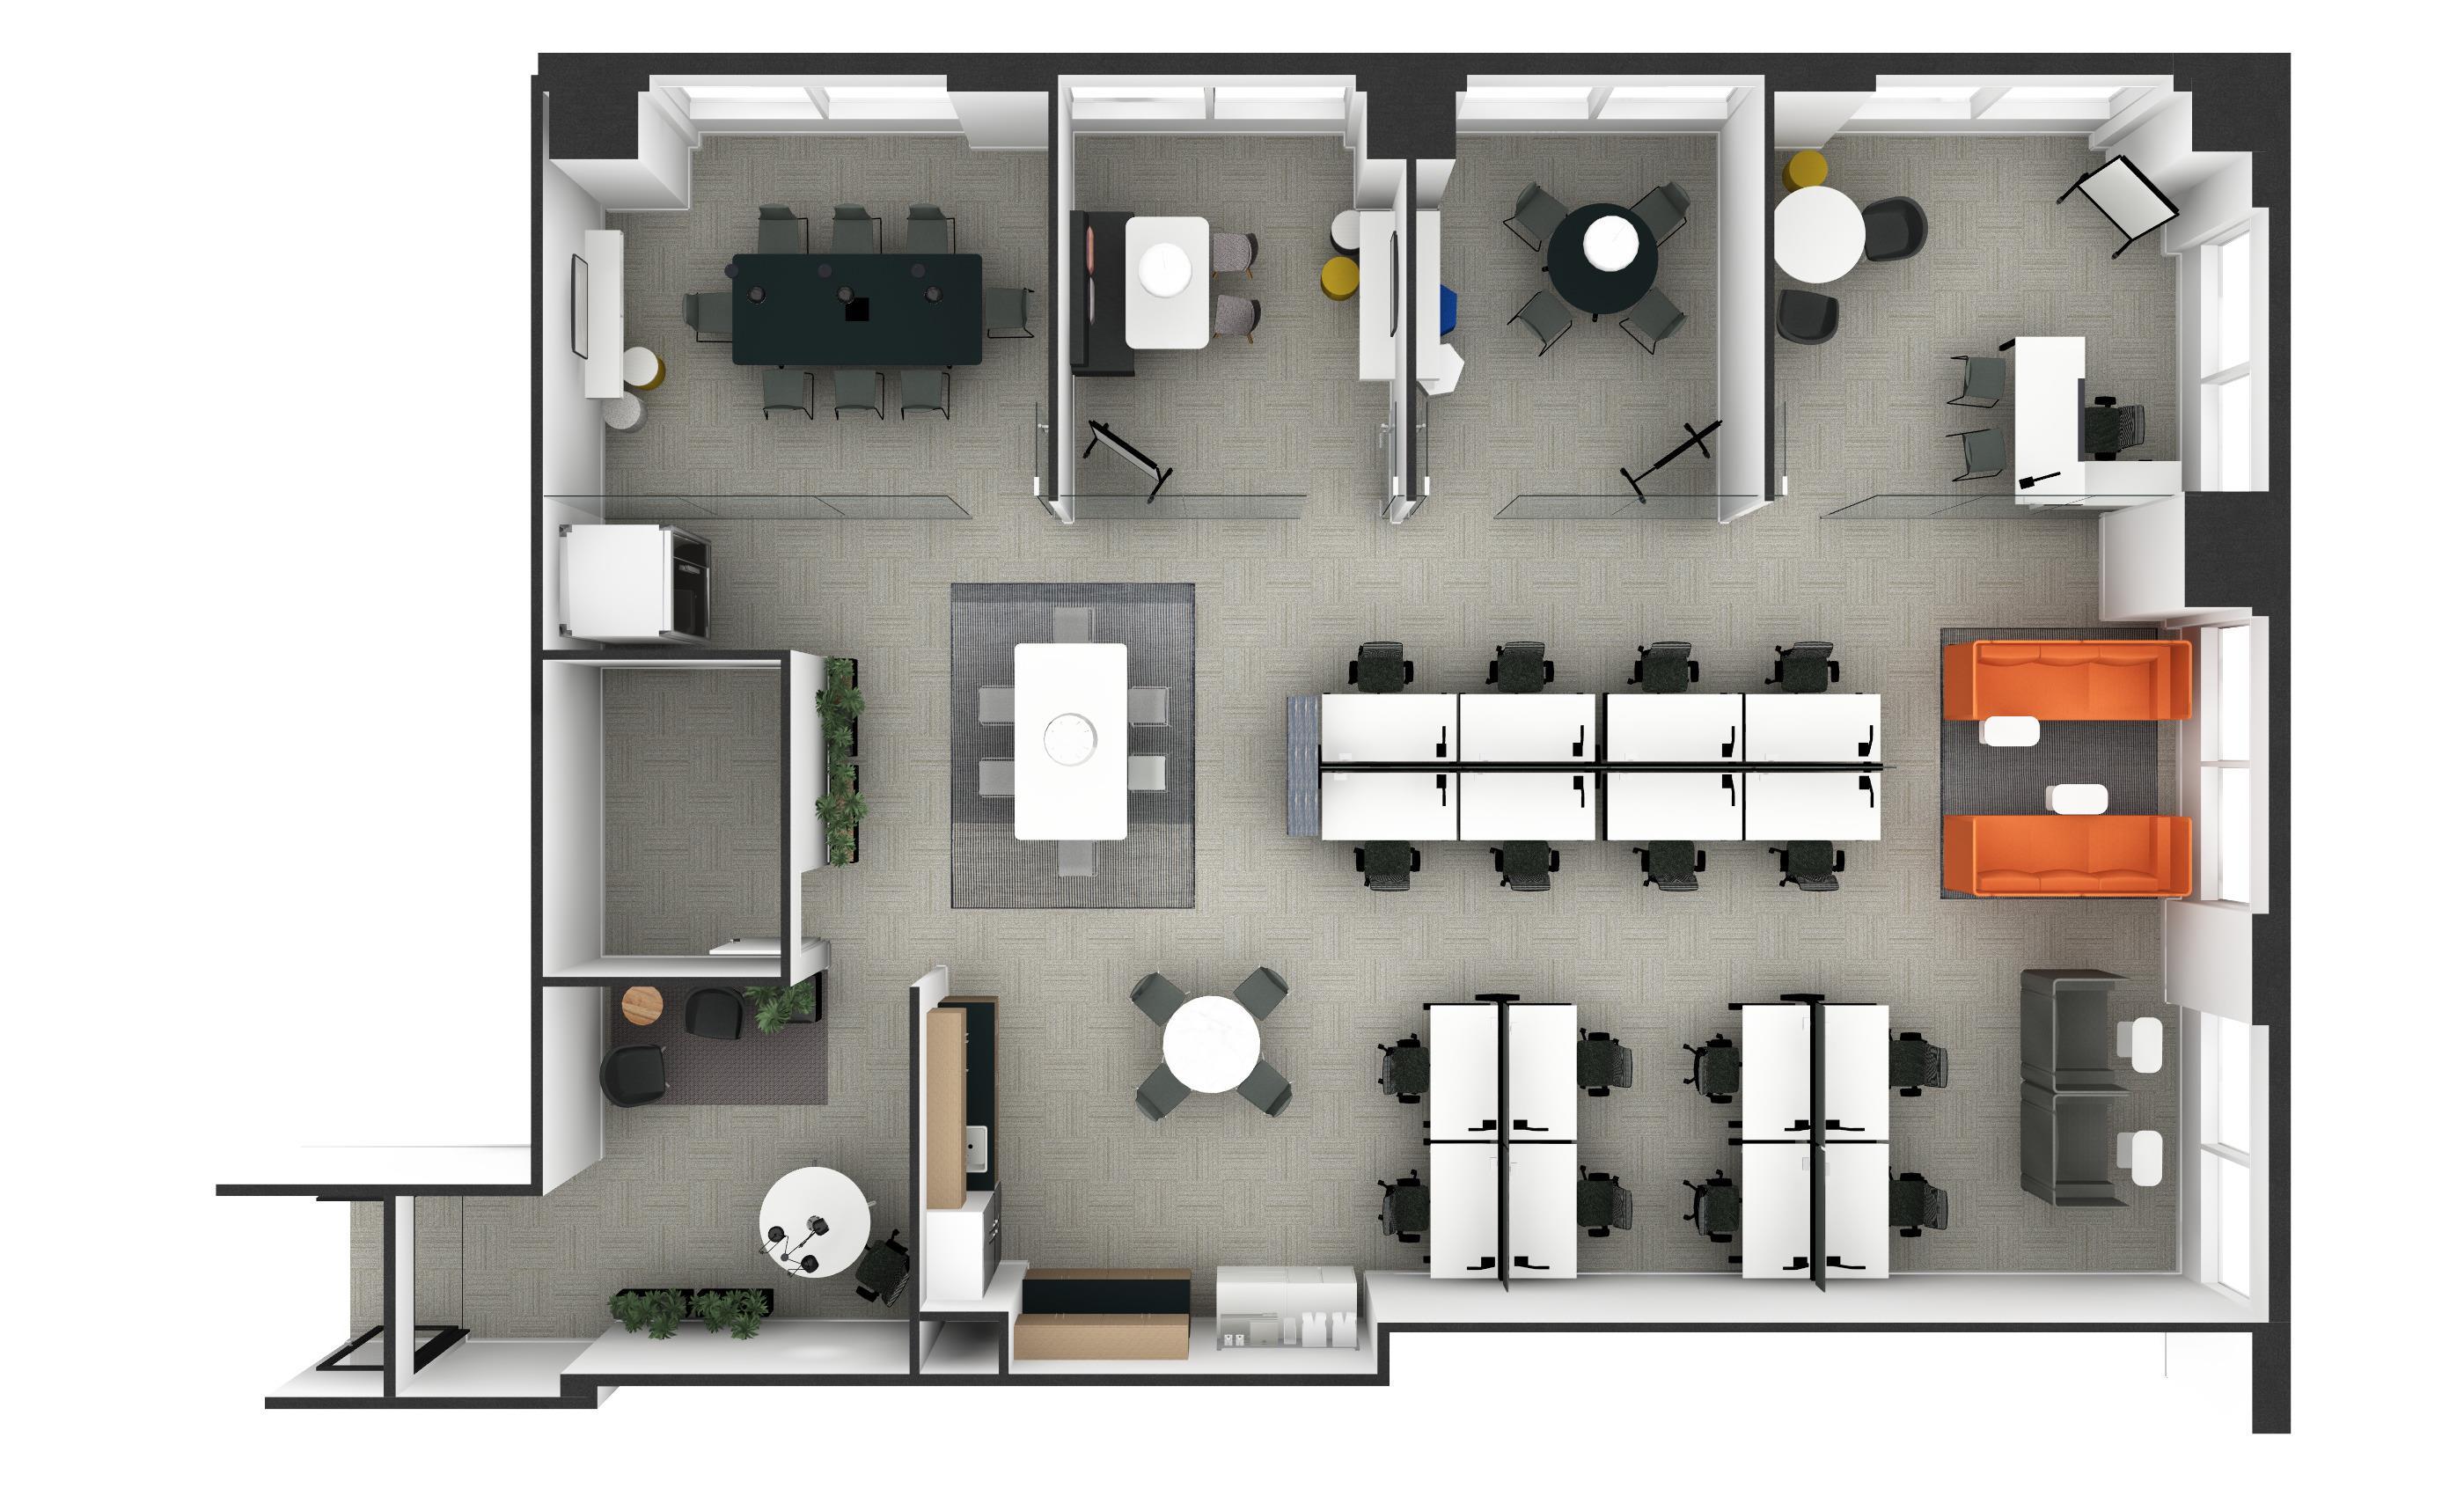 Billingsley   One Arts Plaza - Suite 730 - altSpace